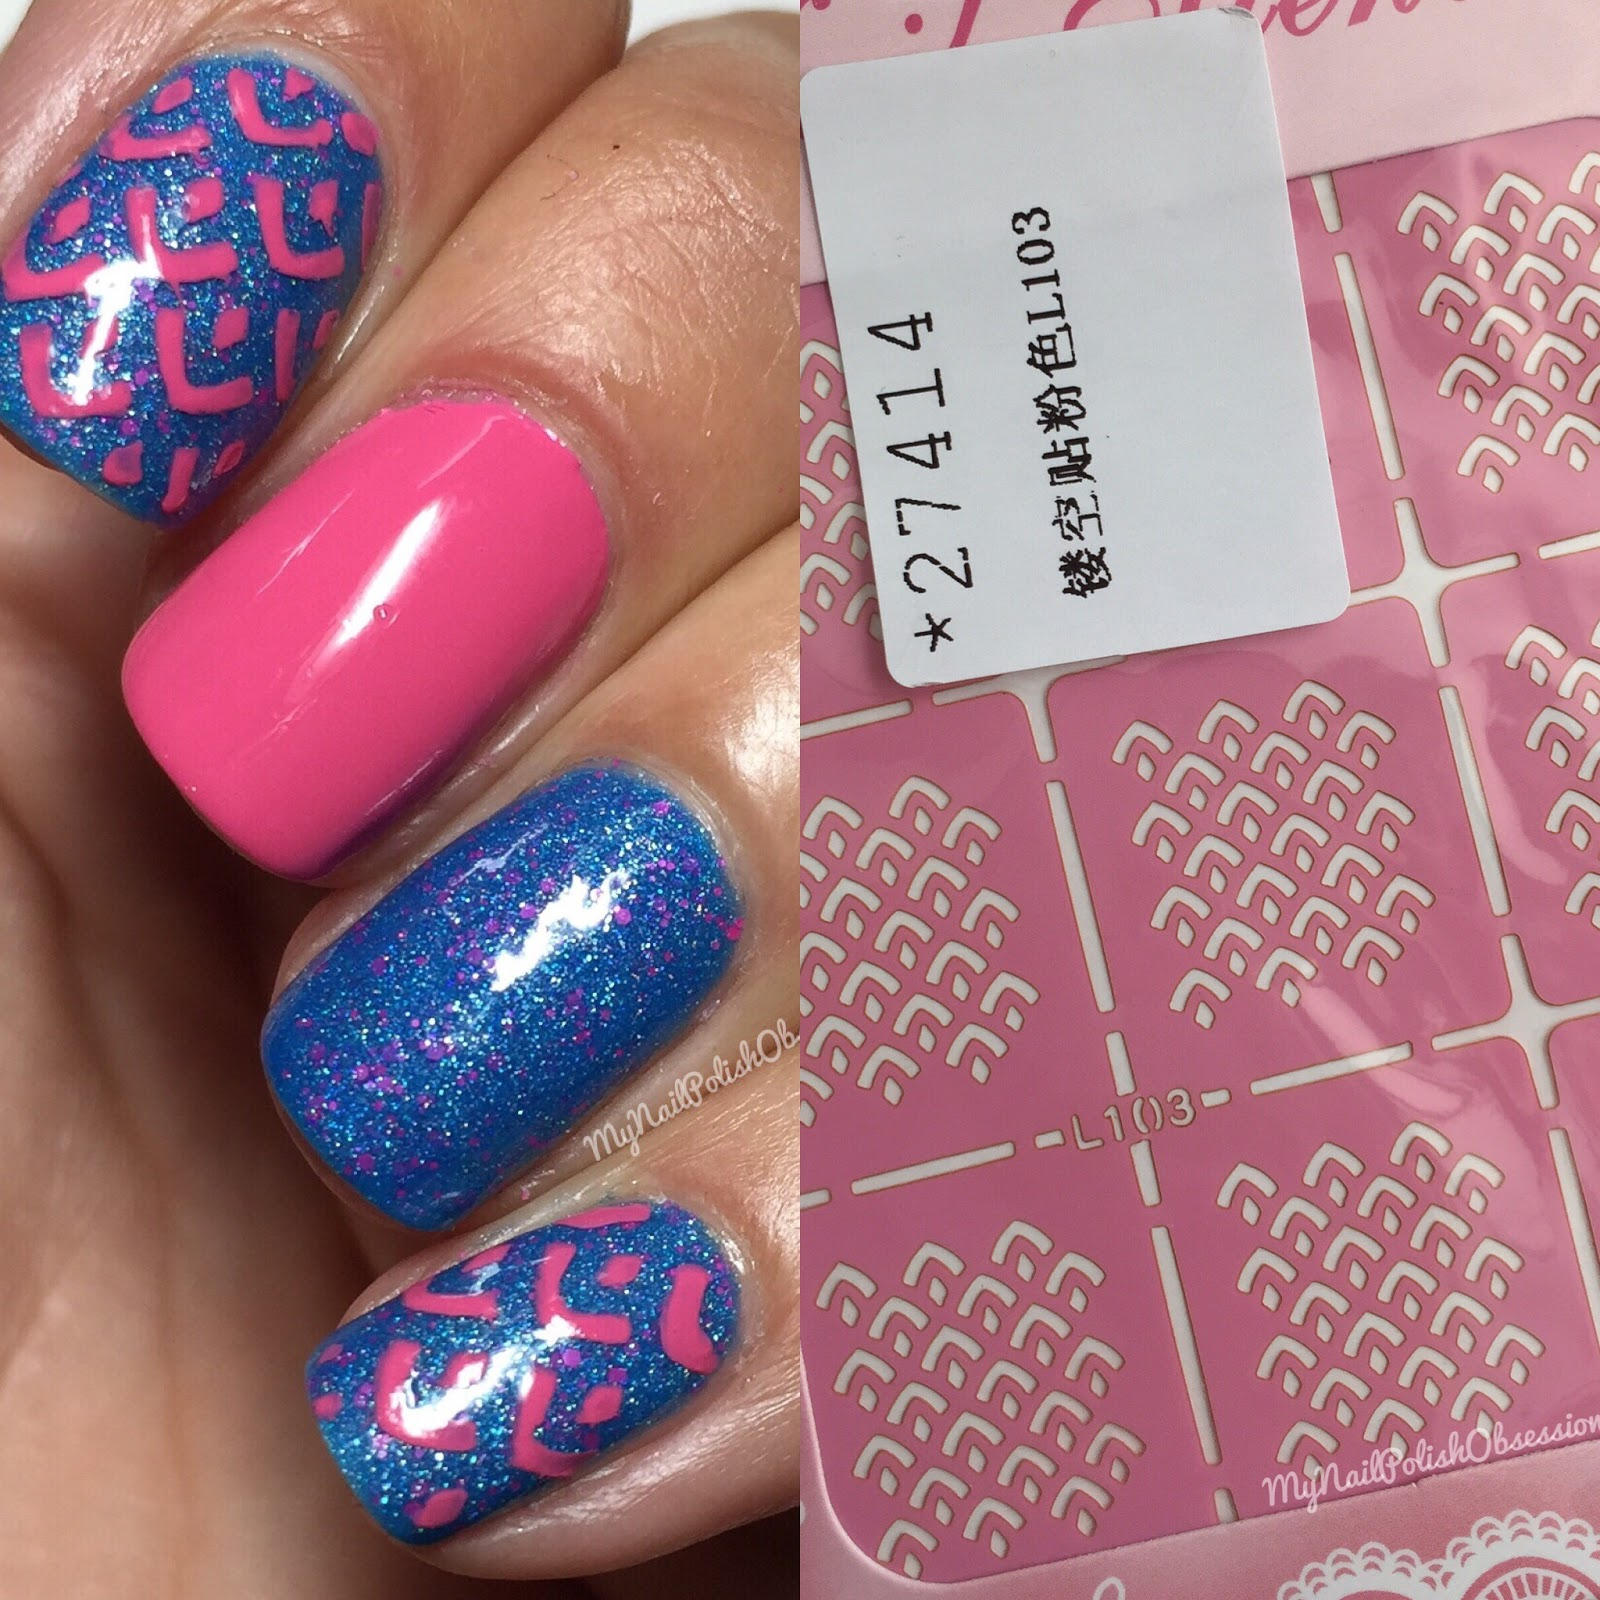 My Nail Polish Obsession: Born Pretty Store: Hollow Nail Art Stencils